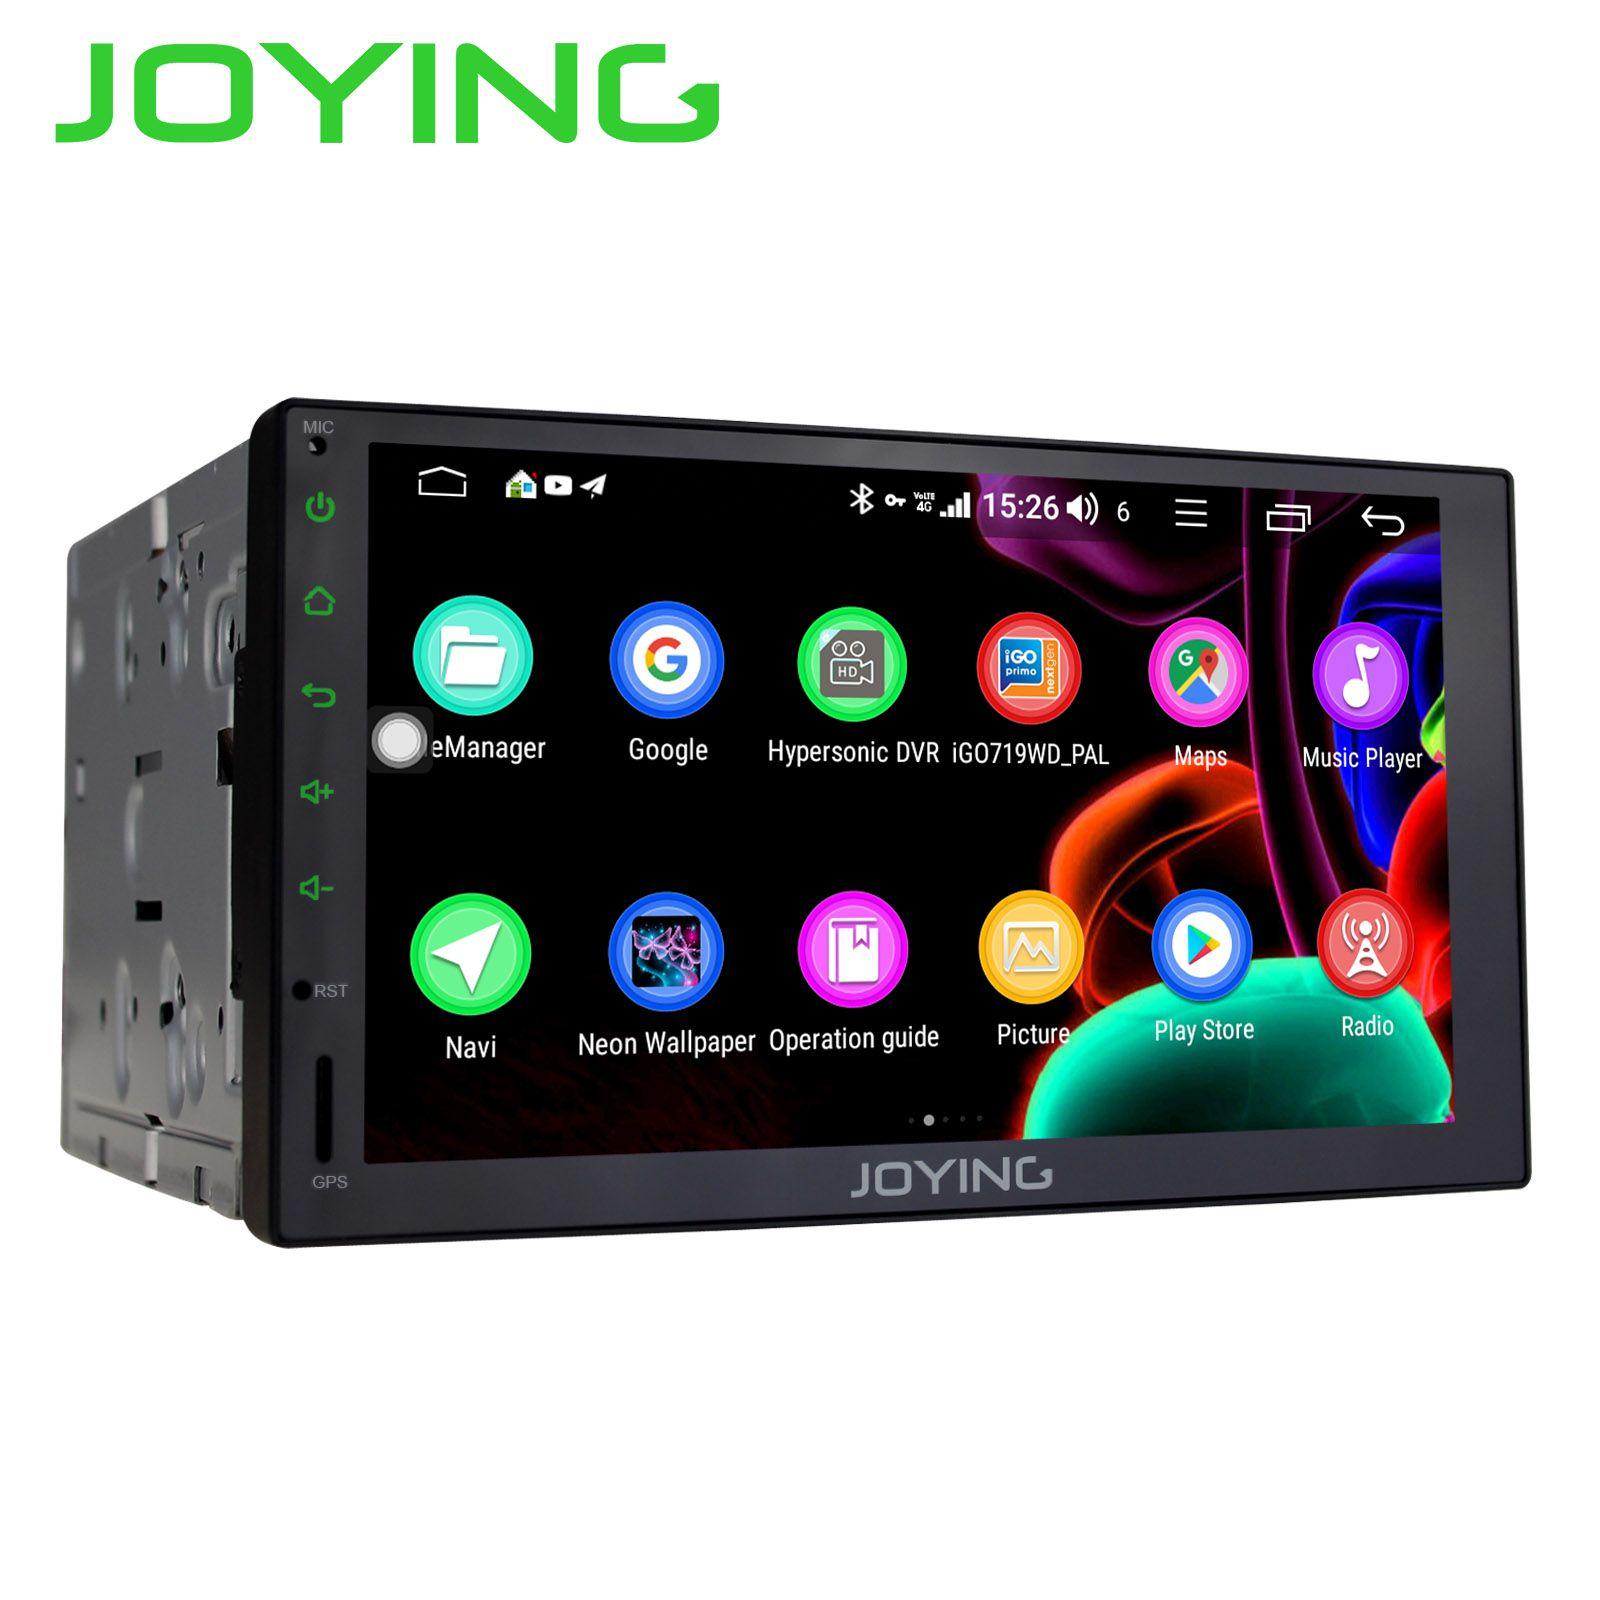 JOYING 2 din auto radio player Octa Core 4GB + 64GB Android 8.1 Unterstützung 4G DSP GPS universal stereo kopf einheit SWC multimedia player